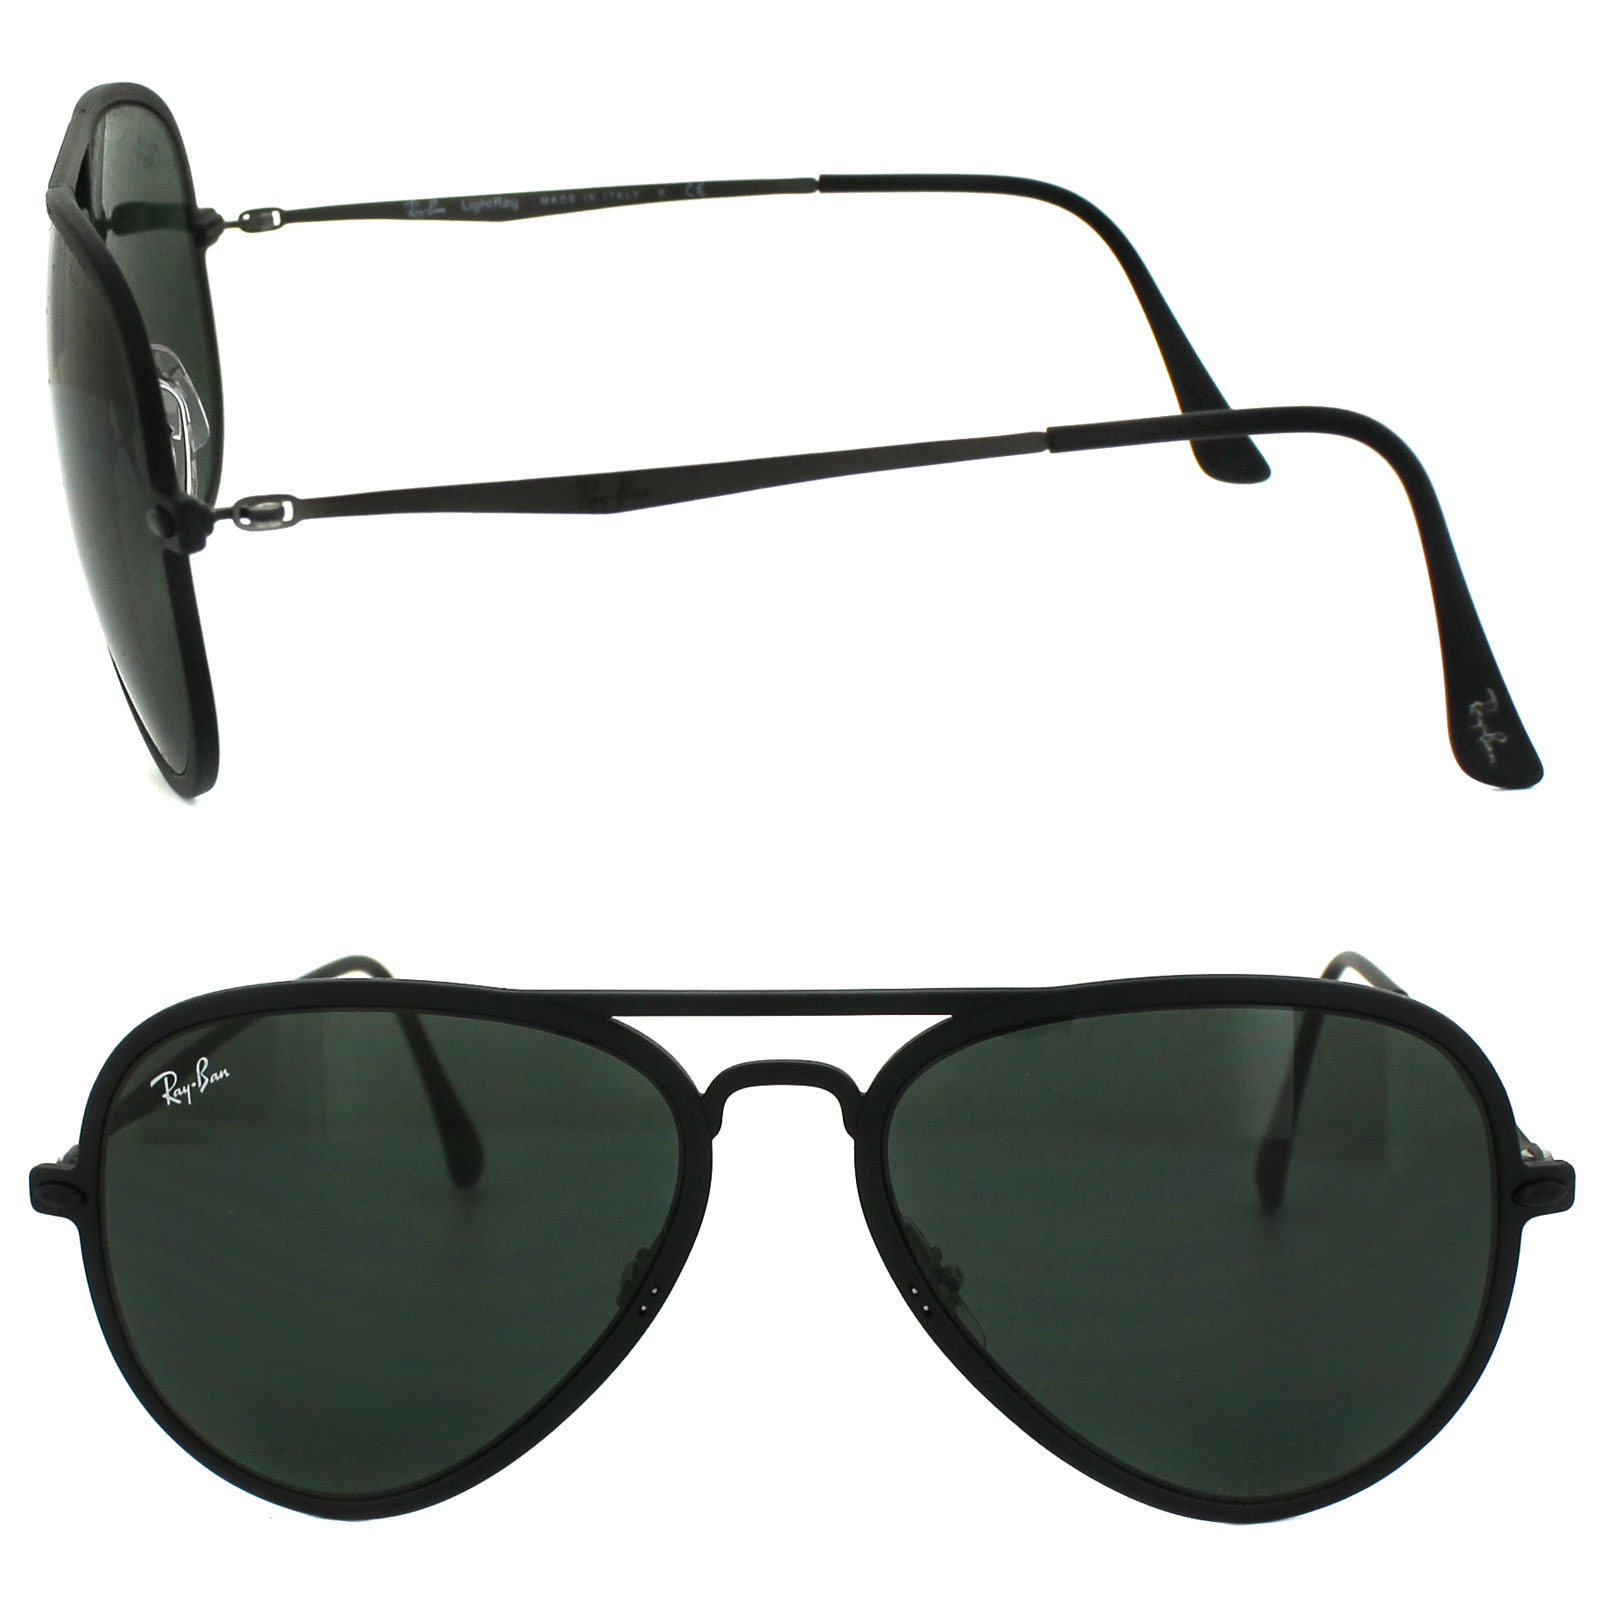 Cheap Ray Ban Aviator Light Ray Ii 4211 Sunglasses